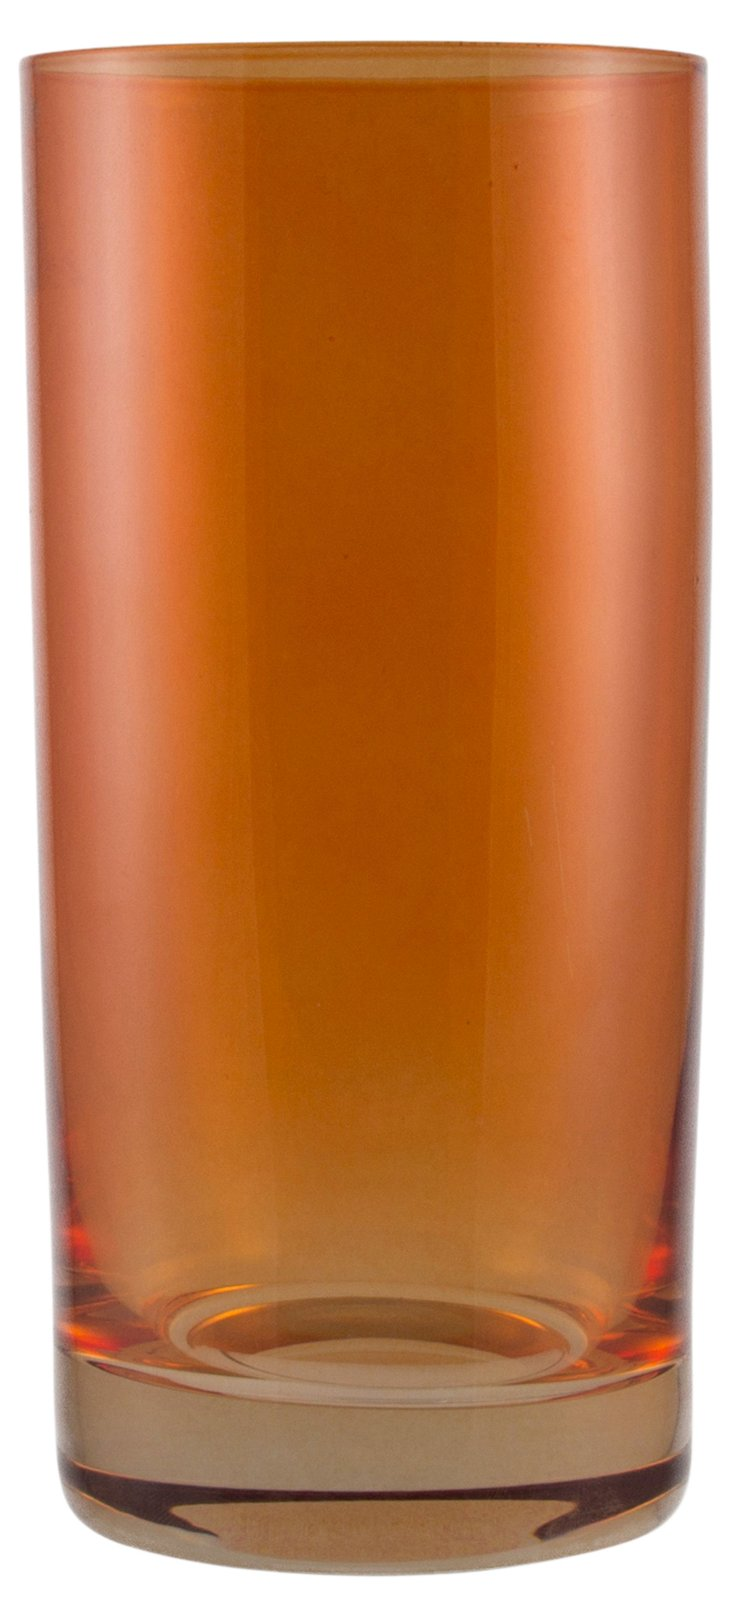 S/6 Glasses, Orange